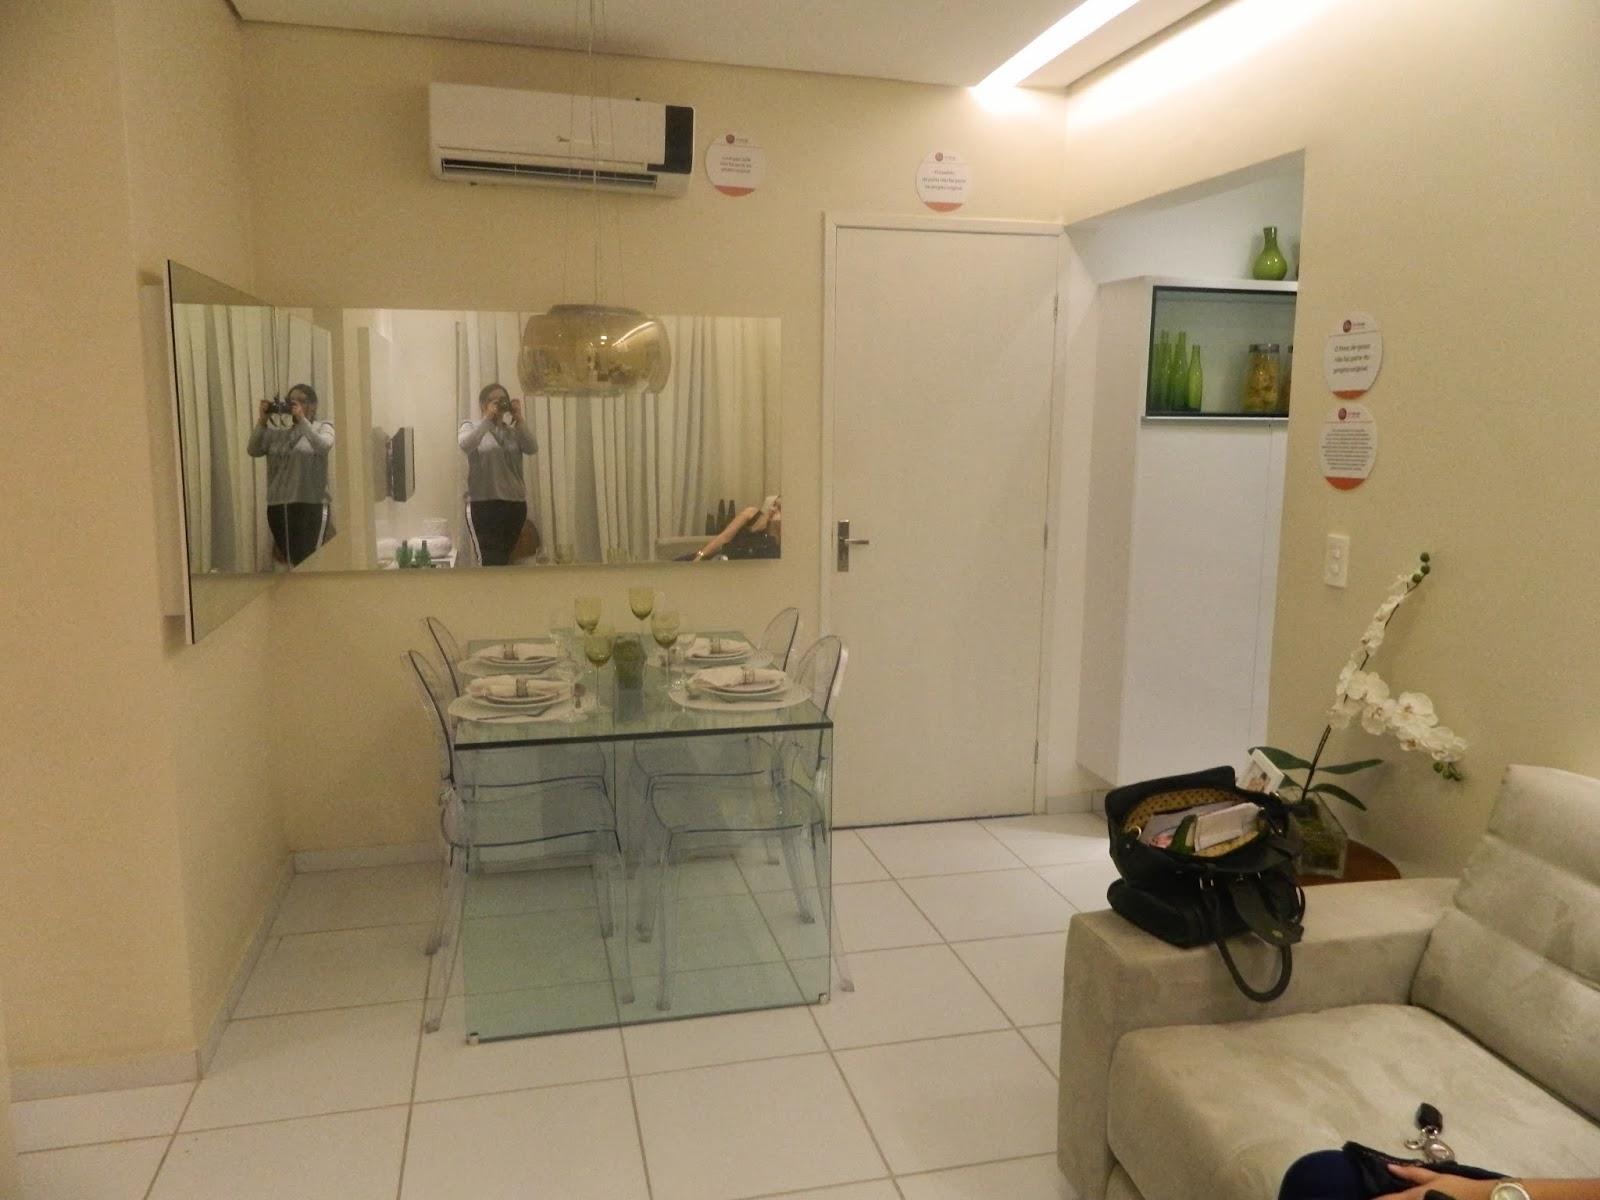 Pruzak Com Lustre Para Sala Pequena De Jantar Id Ias  -> Lustres Pendentes Para Sala De Jantar Pequena